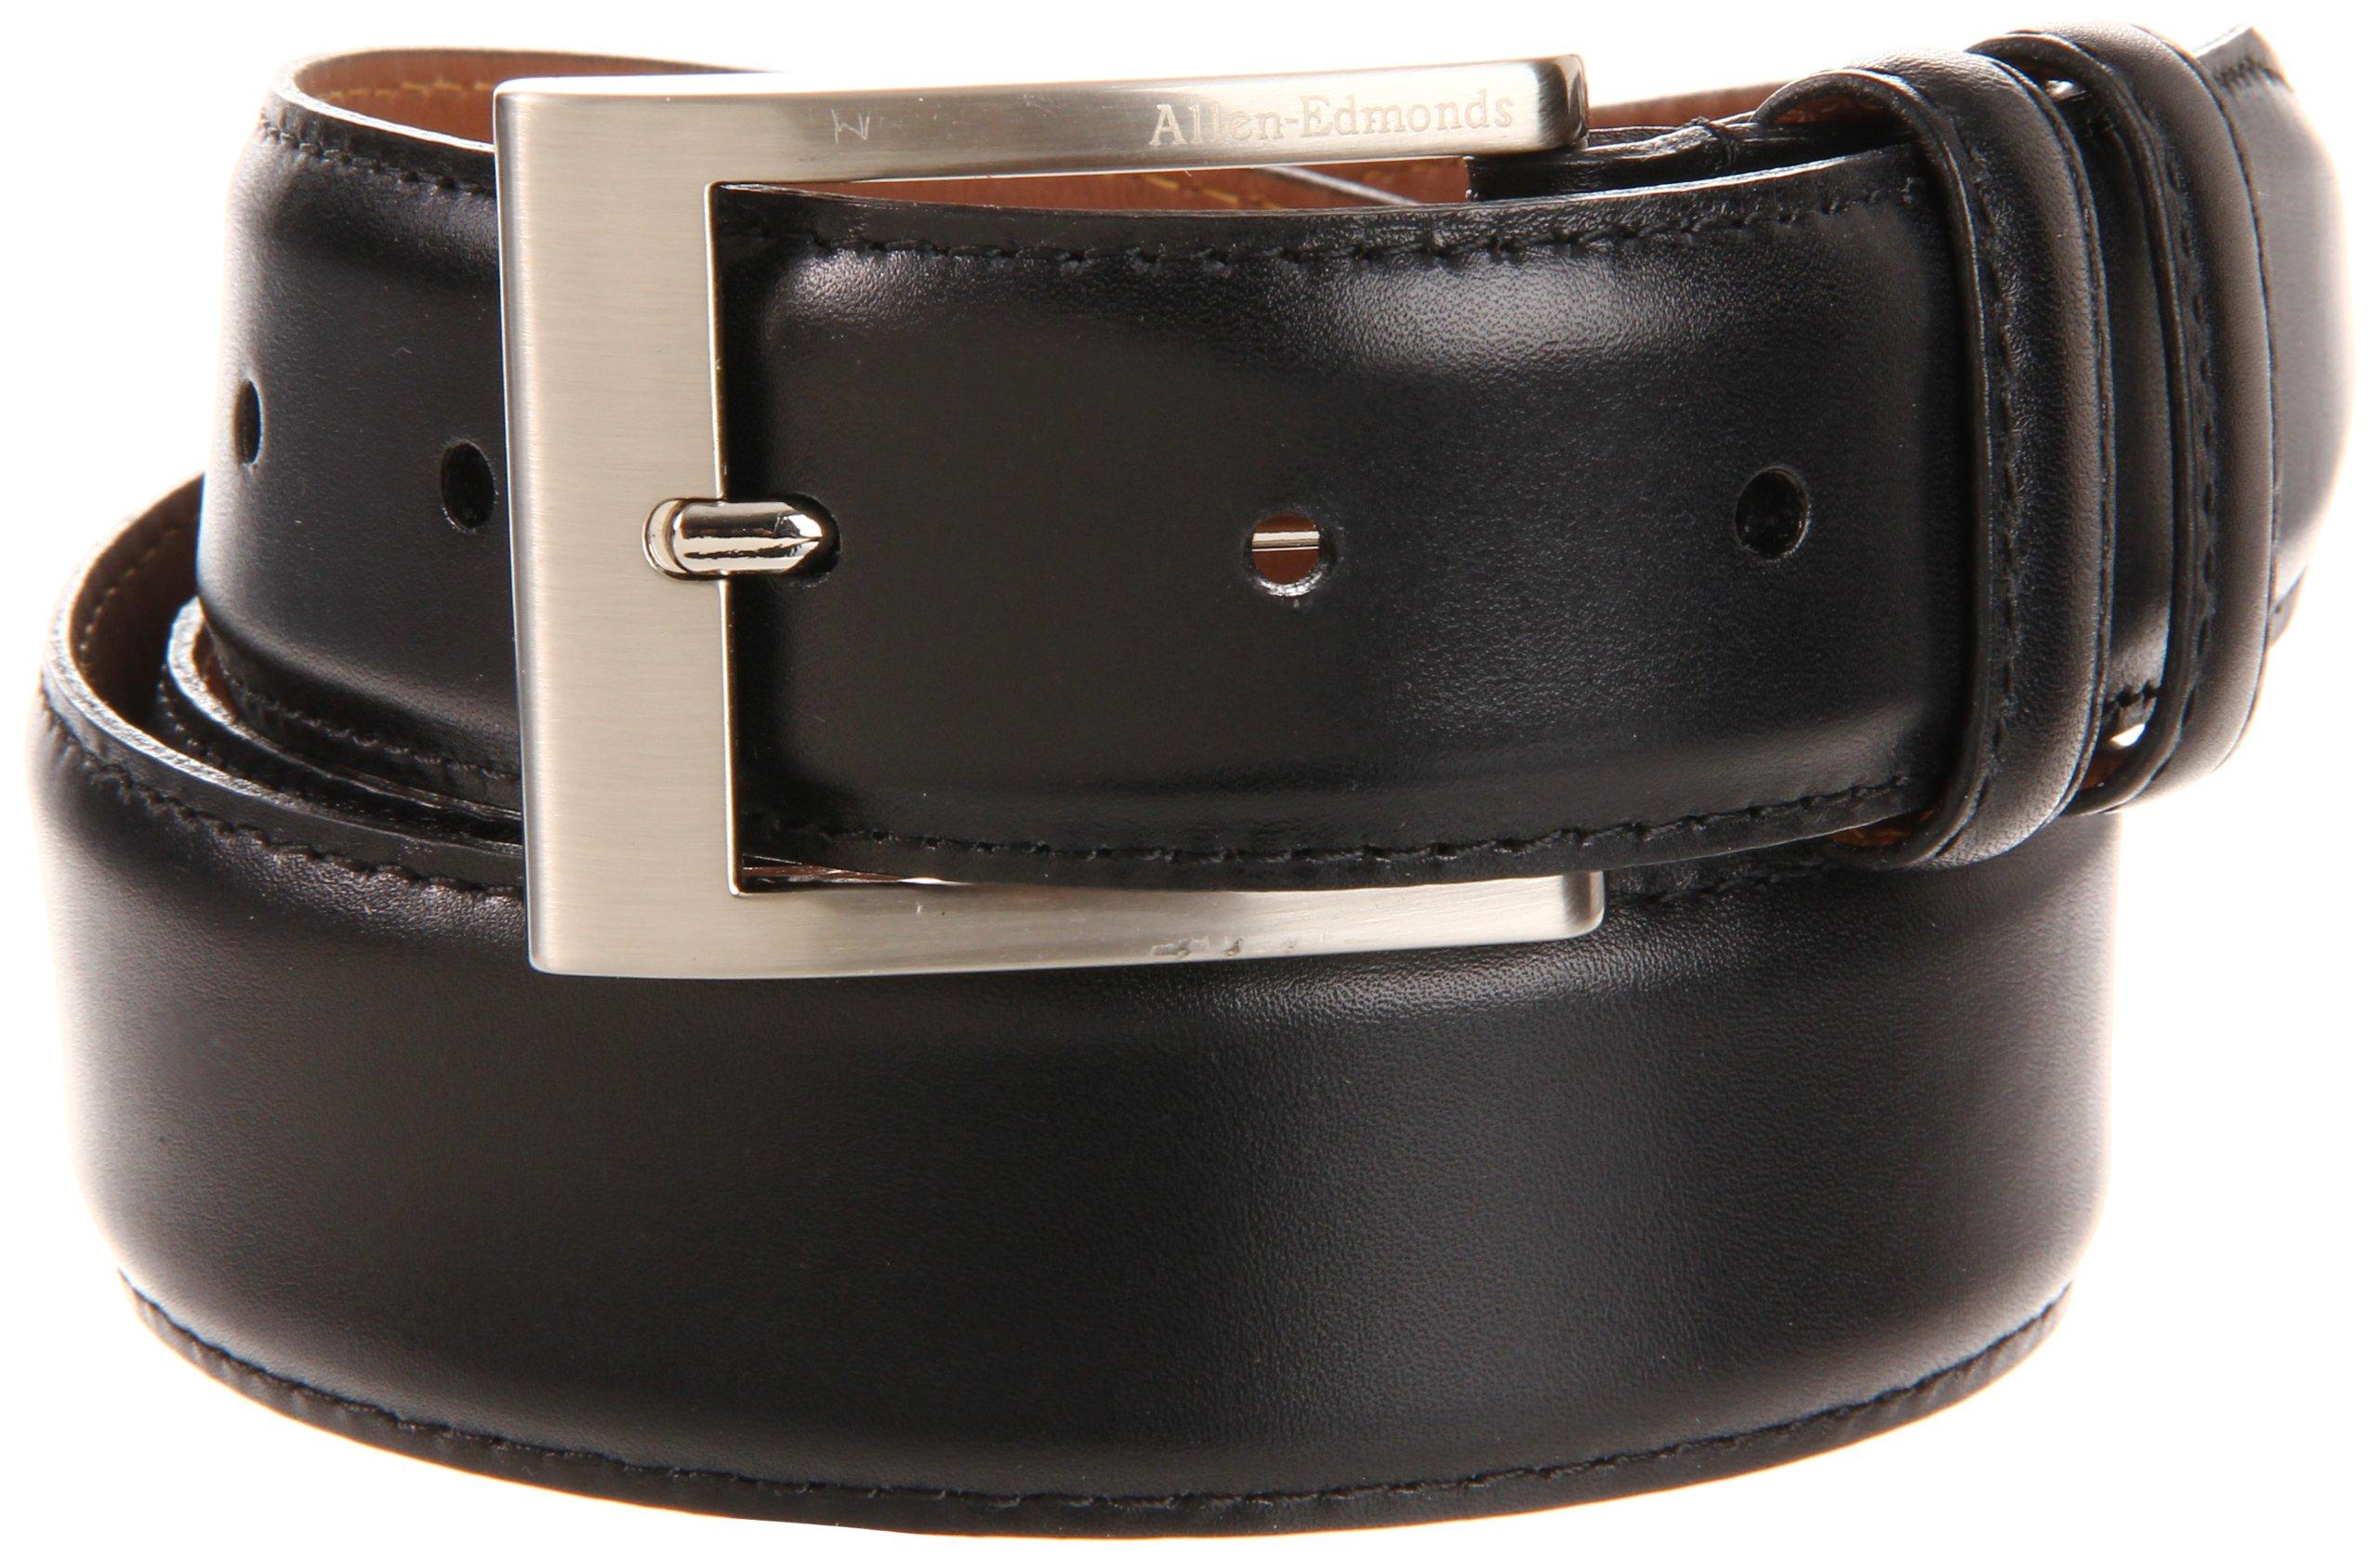 Allen Edmonds Men's Basic Wide Dress Belt, Black, 44